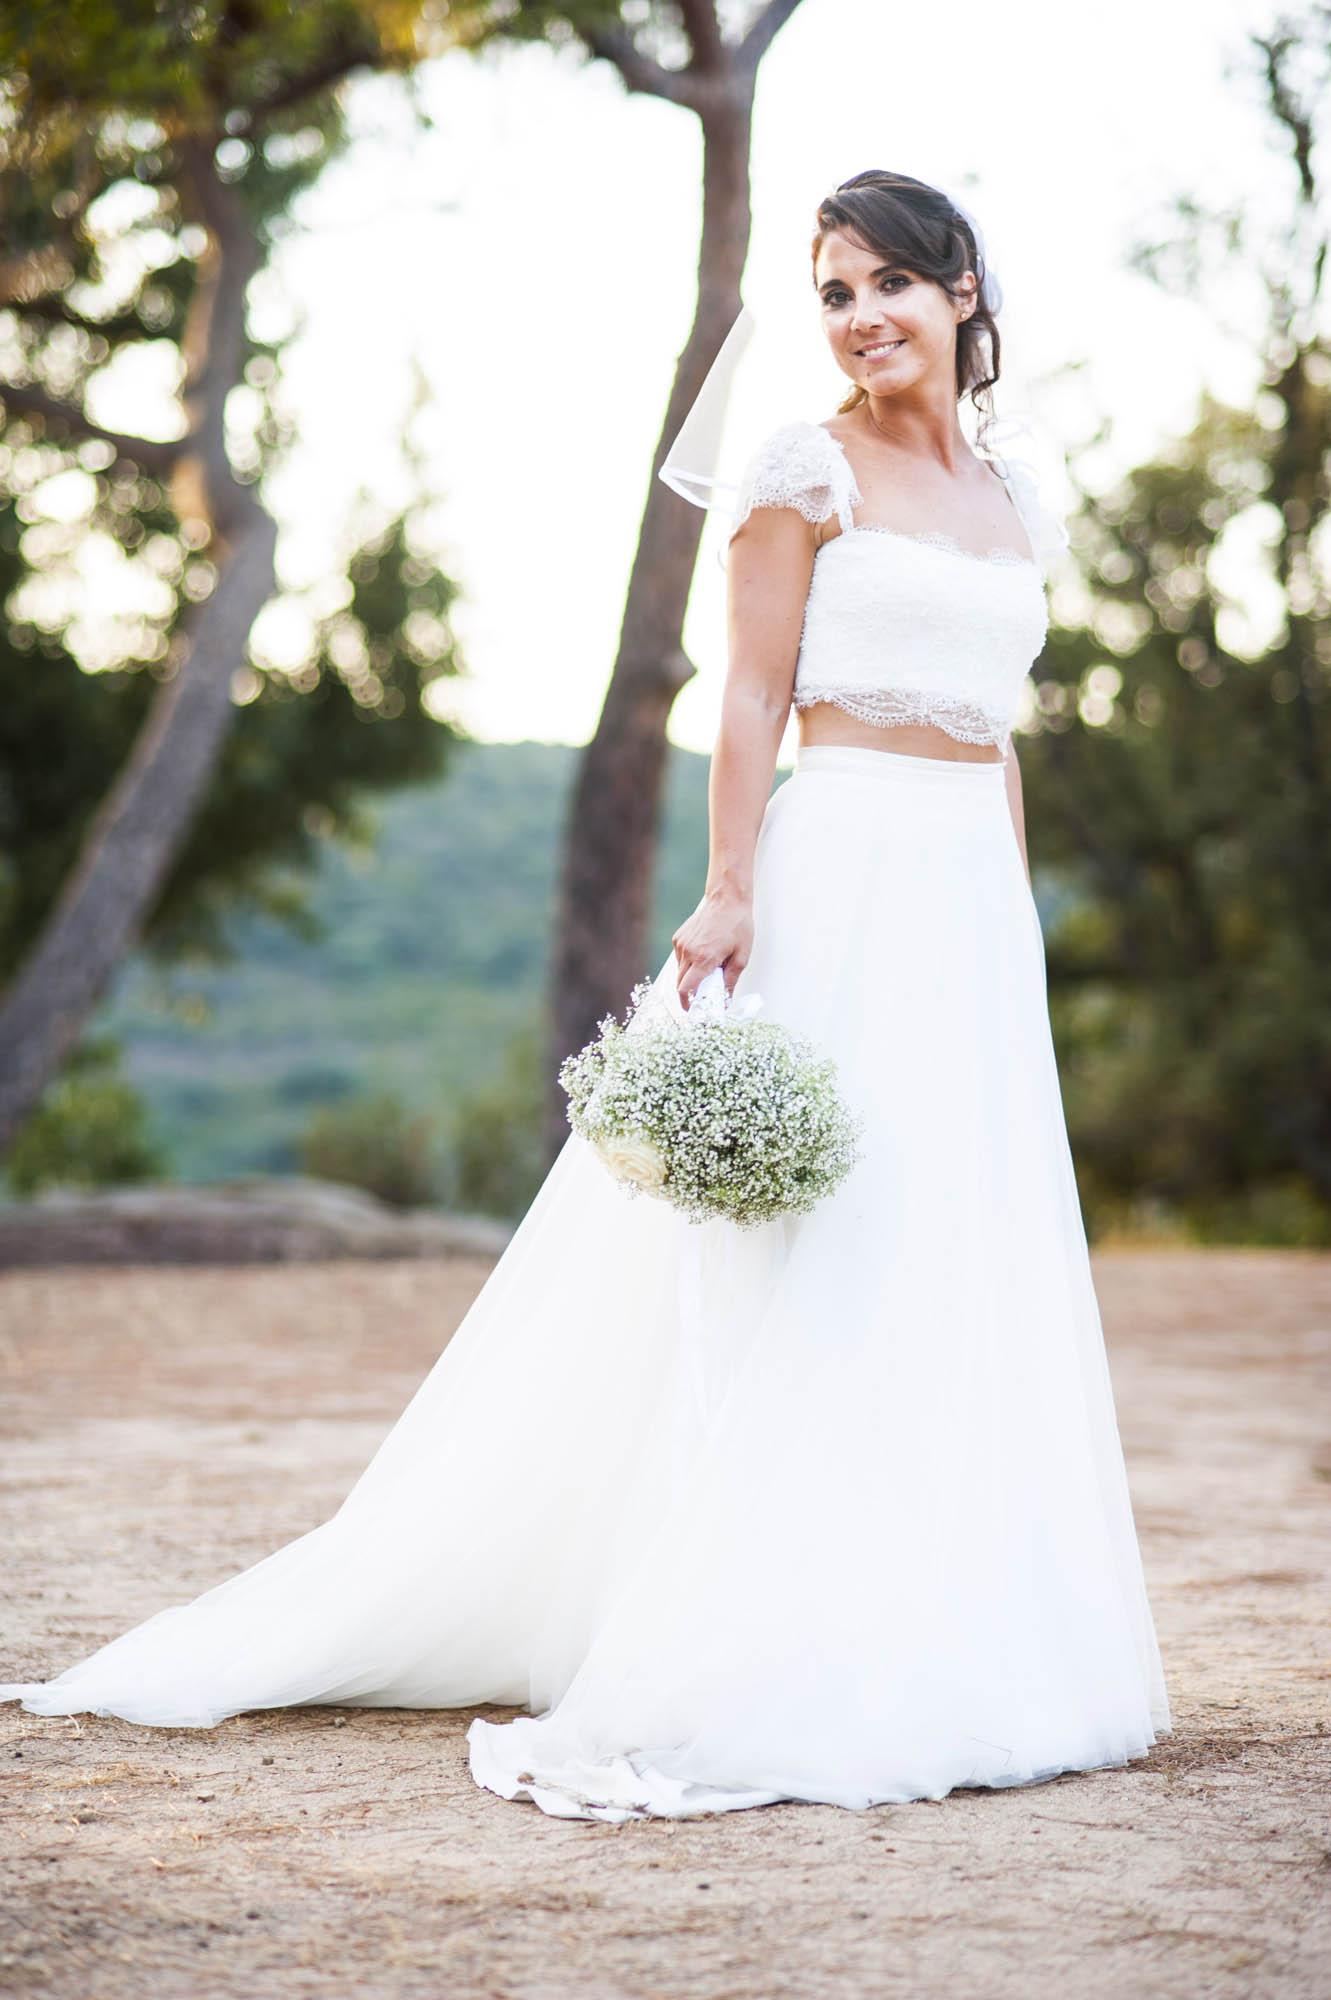 WEDDING-PHOTOGRAPHY-IN-CORSICA_007.jpg